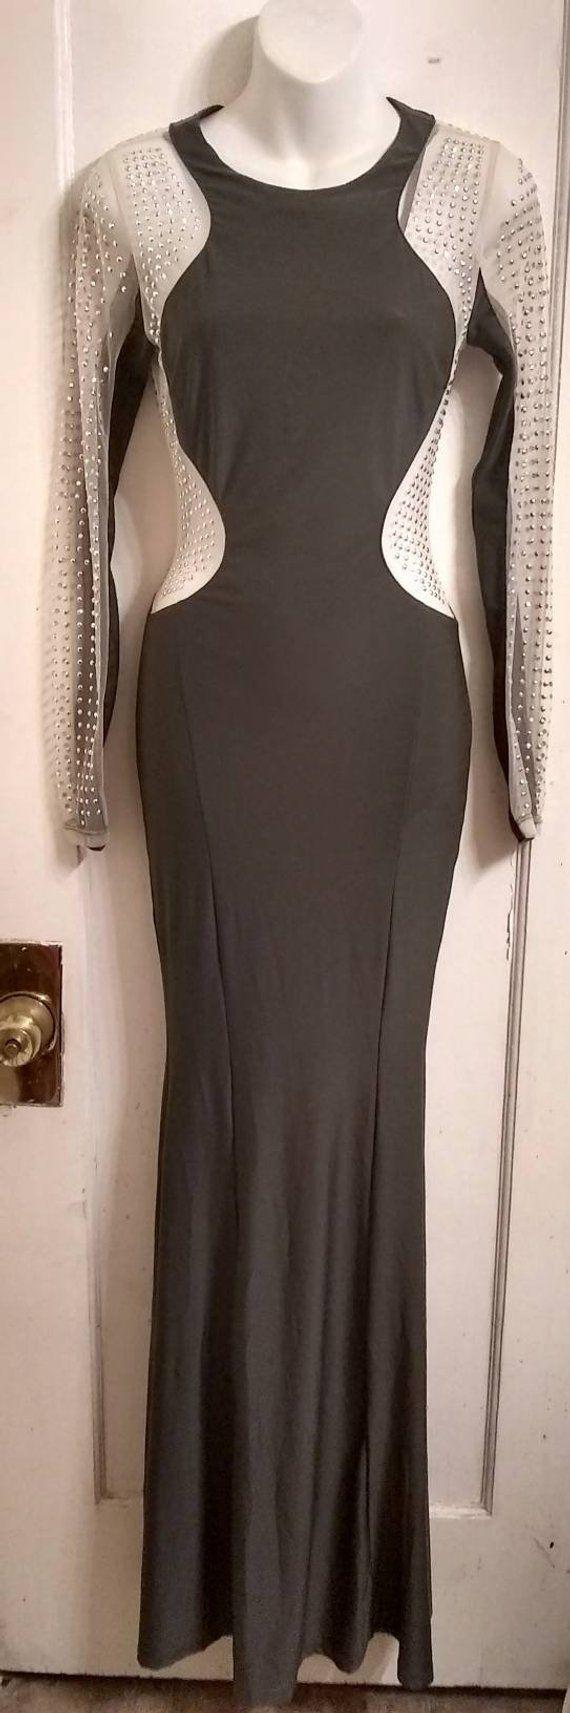 Vintage us formal gown nineties prom dress grey body con floor